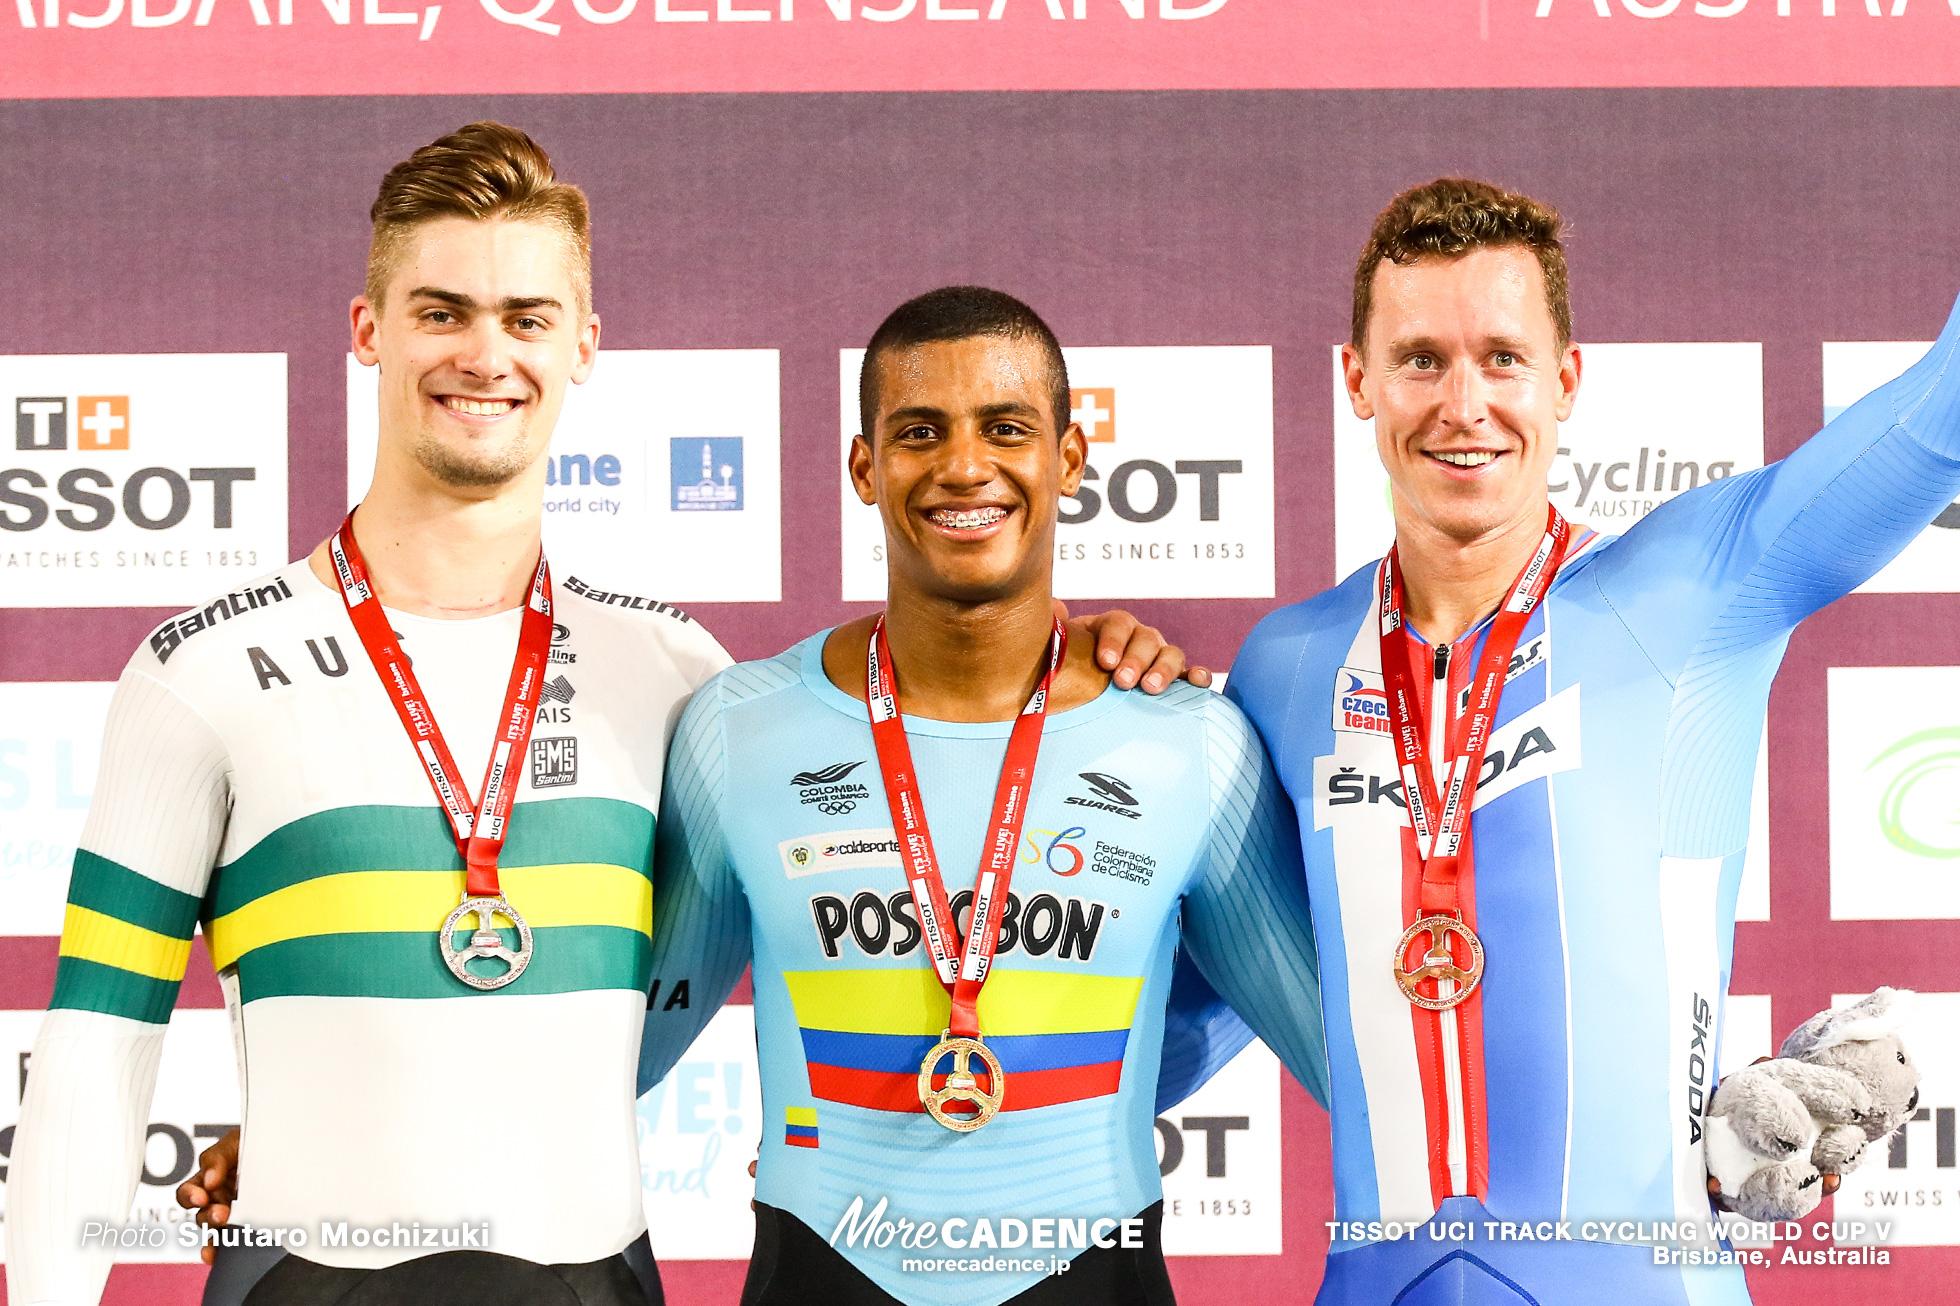 Final / Men's Keirin / TISSOT UCI TRACK CYCLING WORLD CUP V, Brisbane, Australia, Kevin Santiago QUINTERO CHAVARRO ケビン・キンテロ Matthew GLAETZER マシュー・グレーツァー Tomas BABEK トマシュ・バベク